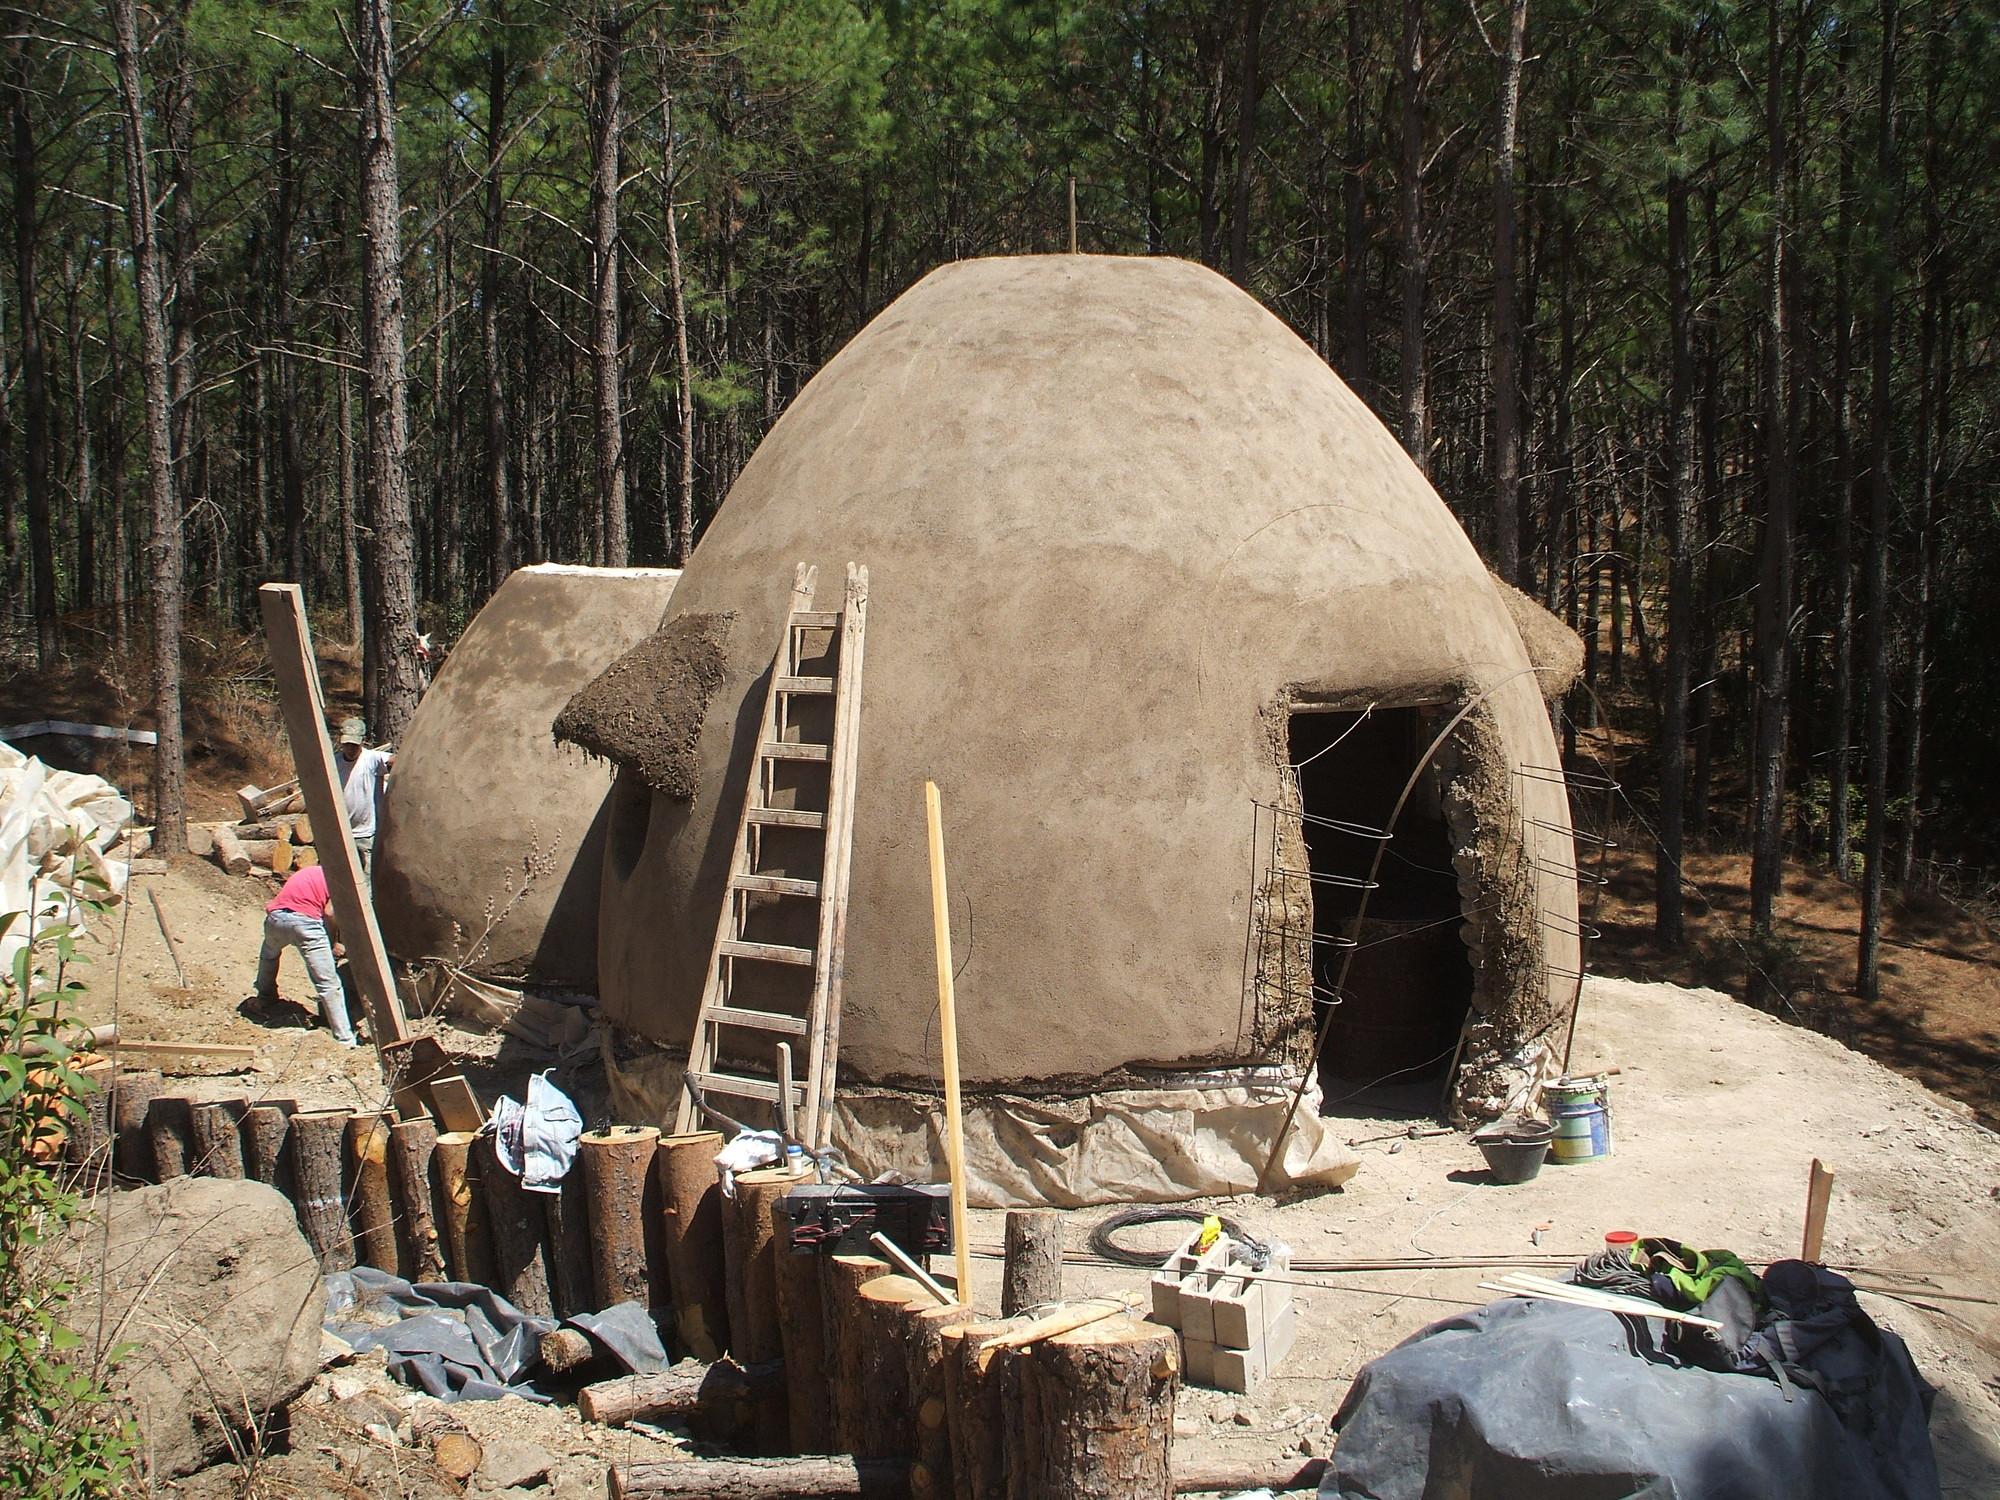 Galer a de una casa de c pulas de barro en argentina 4 for Faroles de barro para jardin